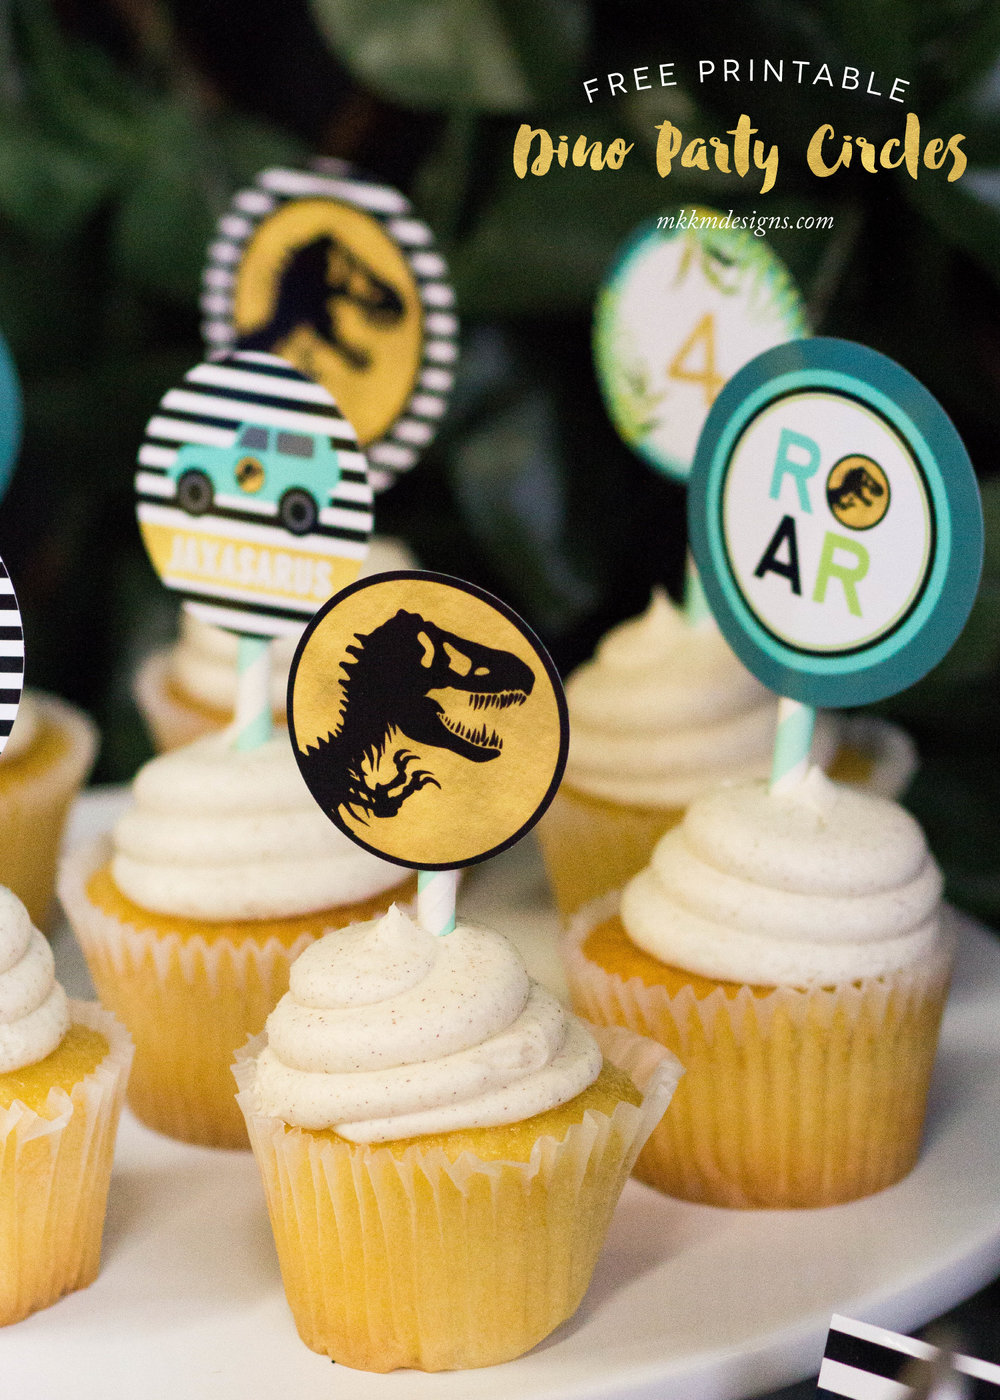 Free Printable Dinosaur Cupcake toppers by MKKMDesigns